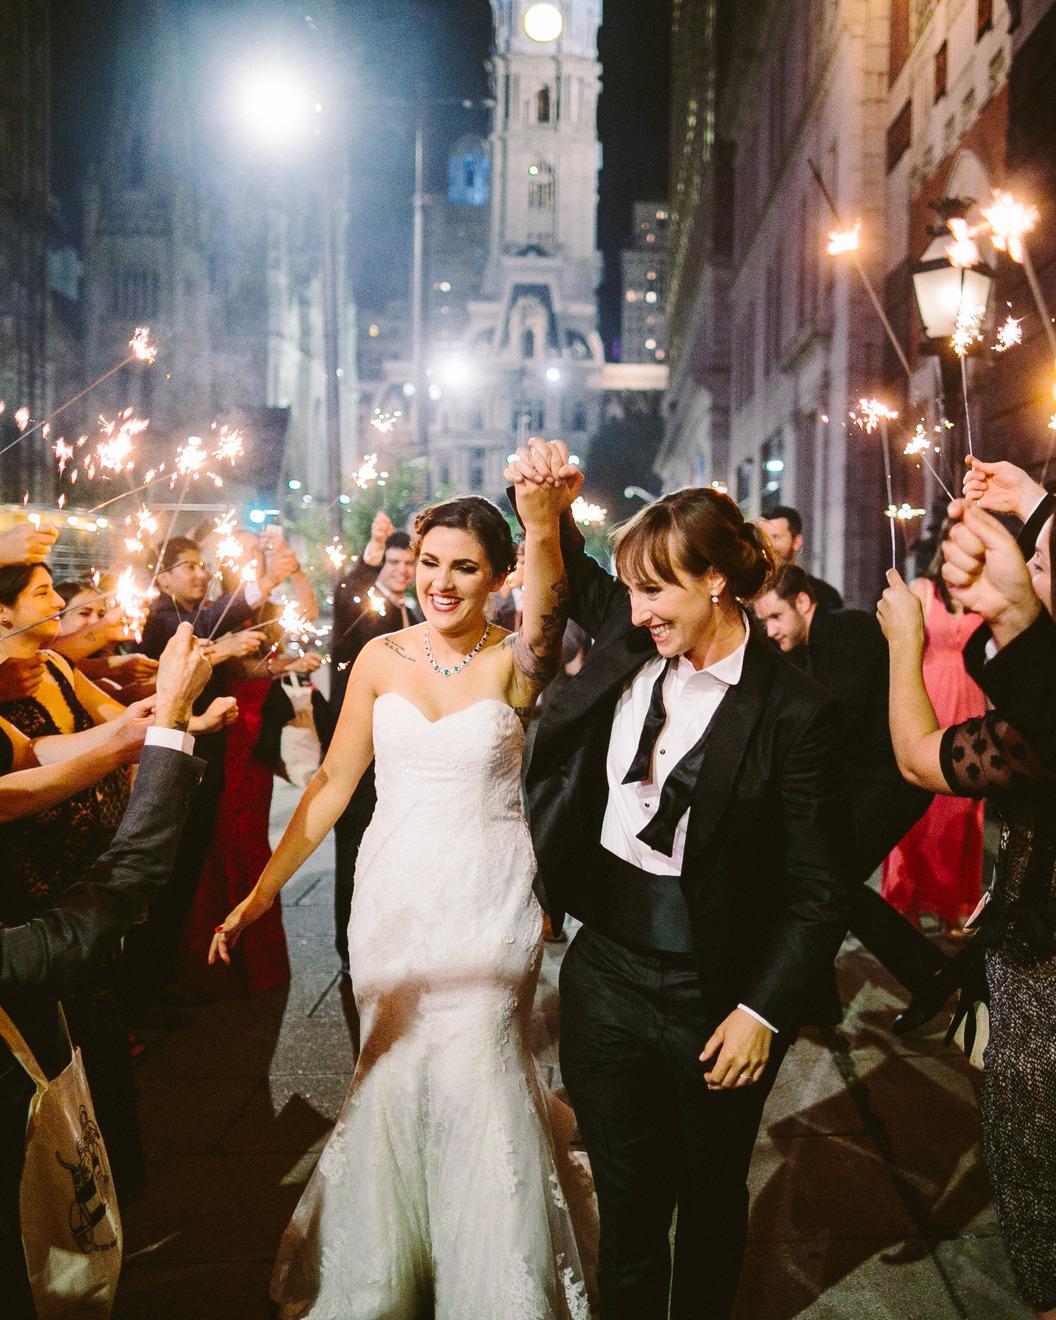 Deb & Meryl's wedding sparklers